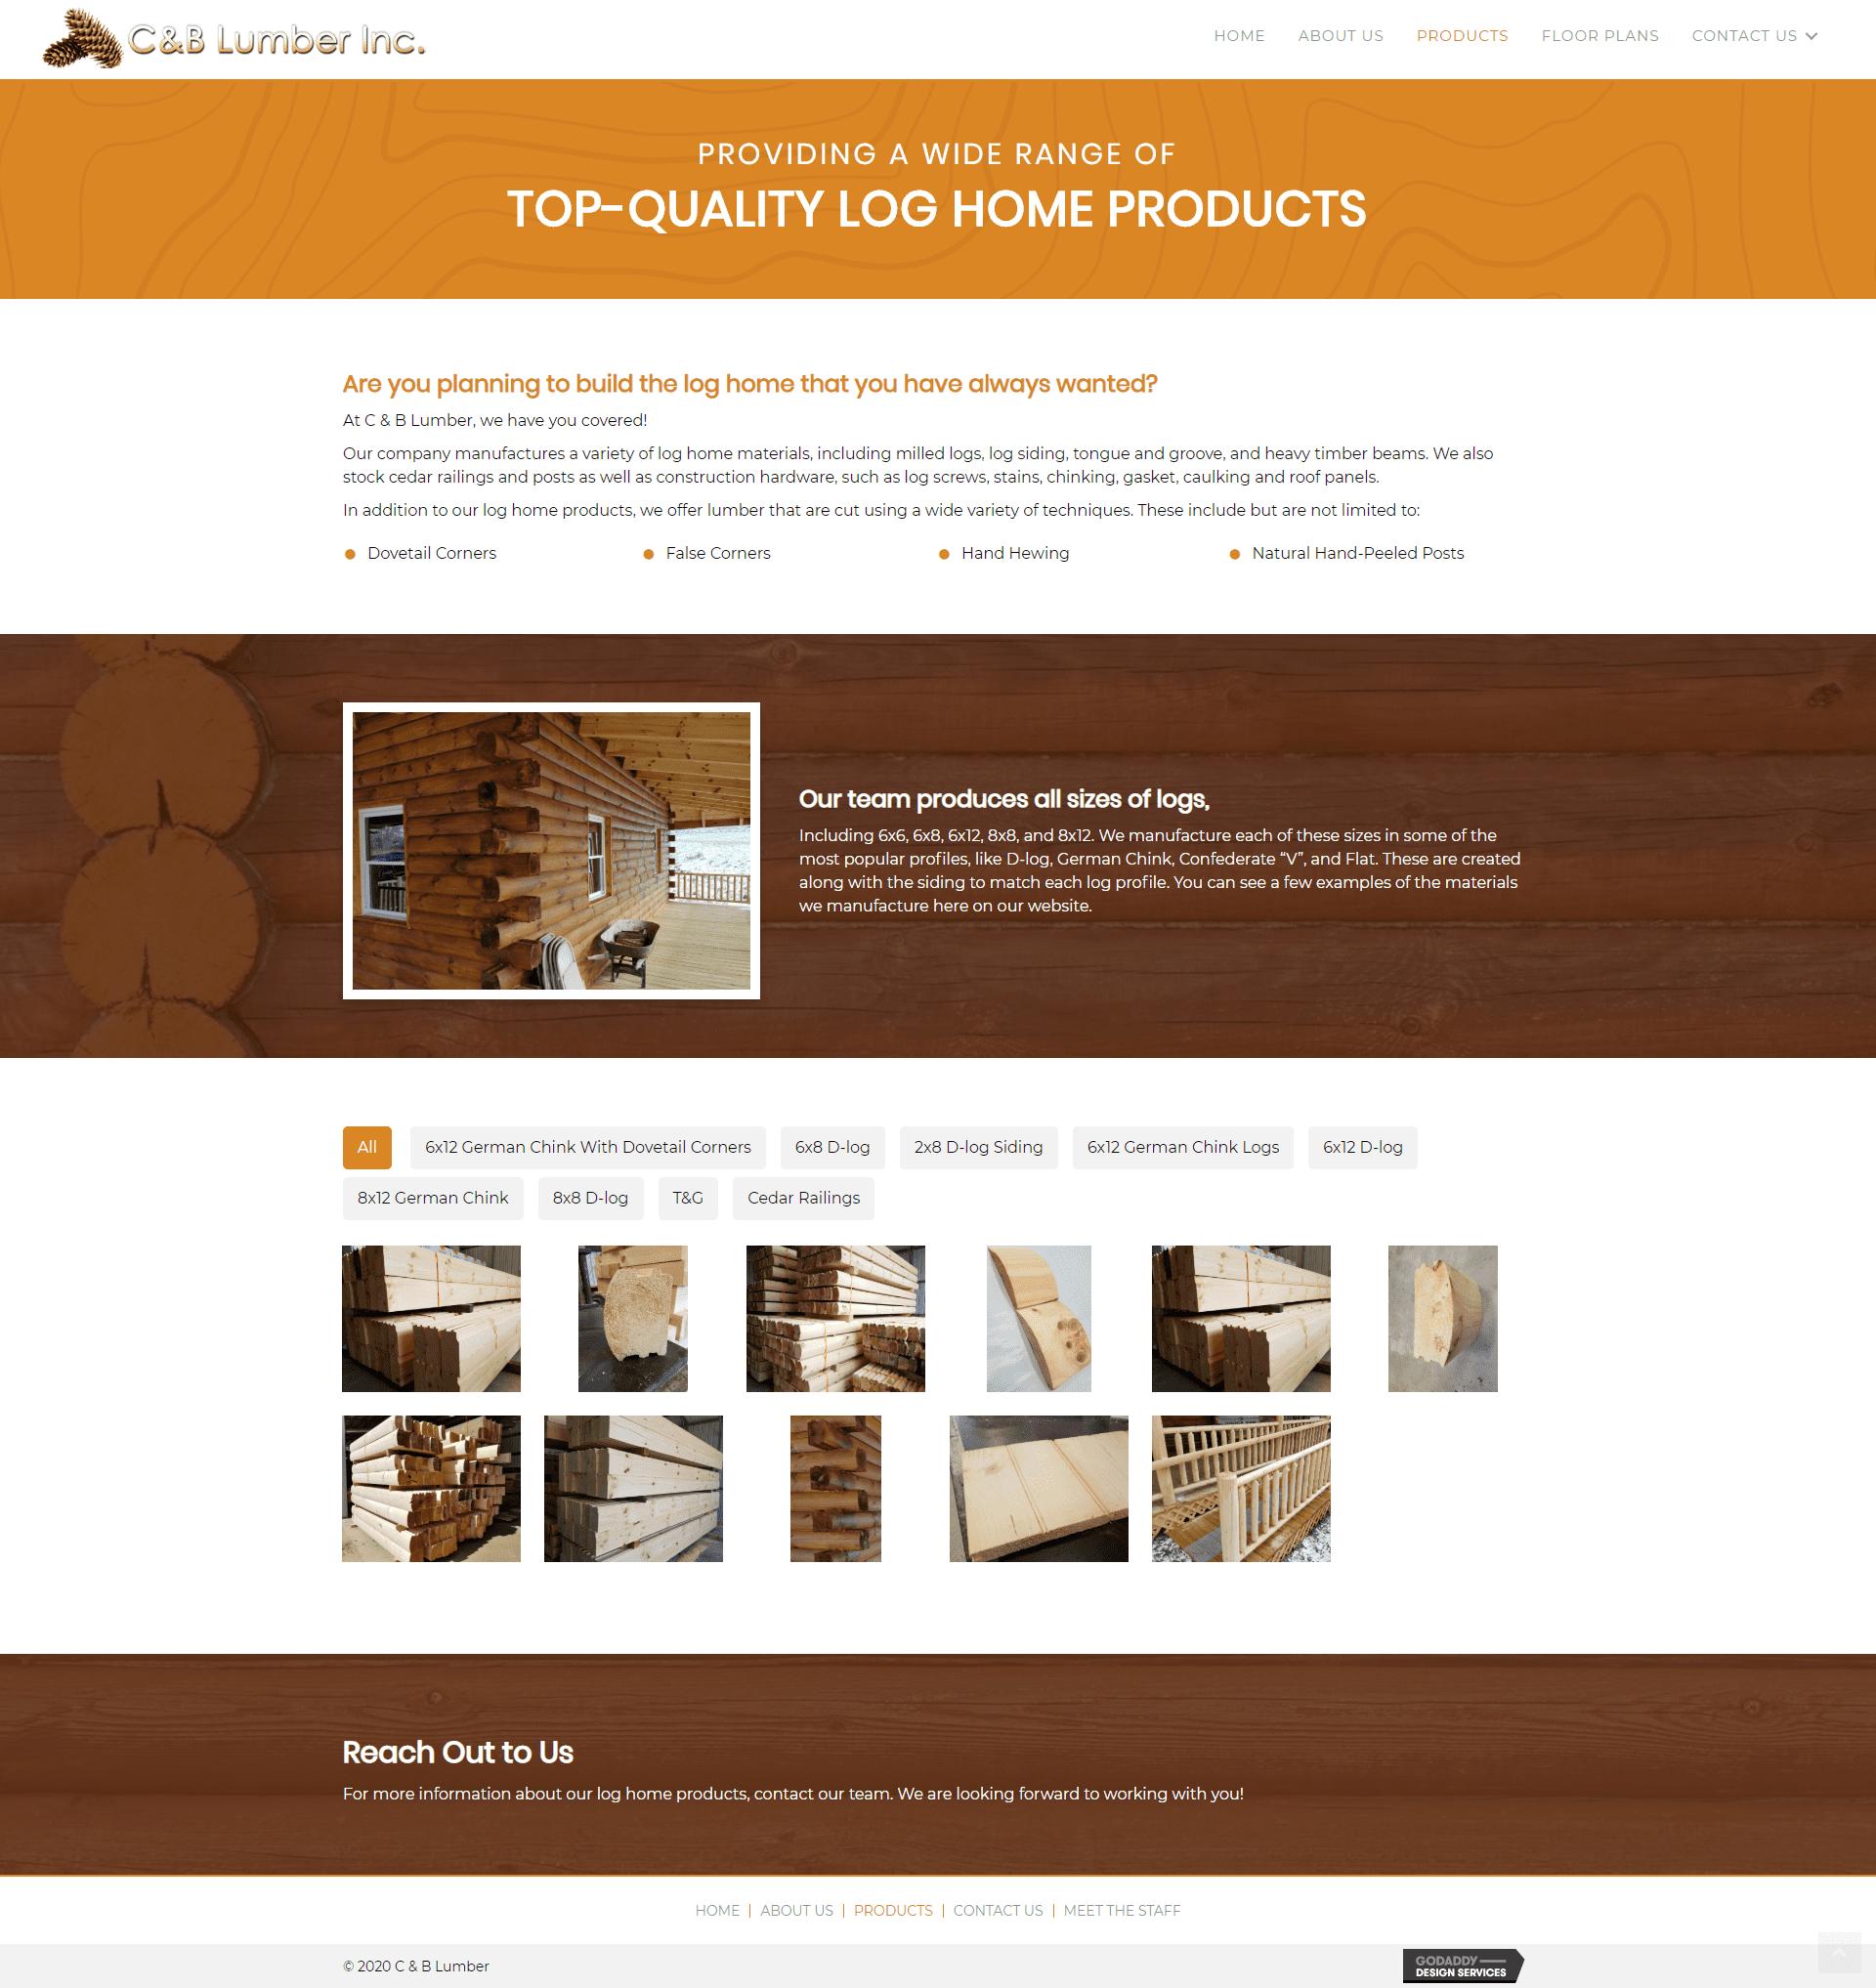 screencapture-candblumber-products